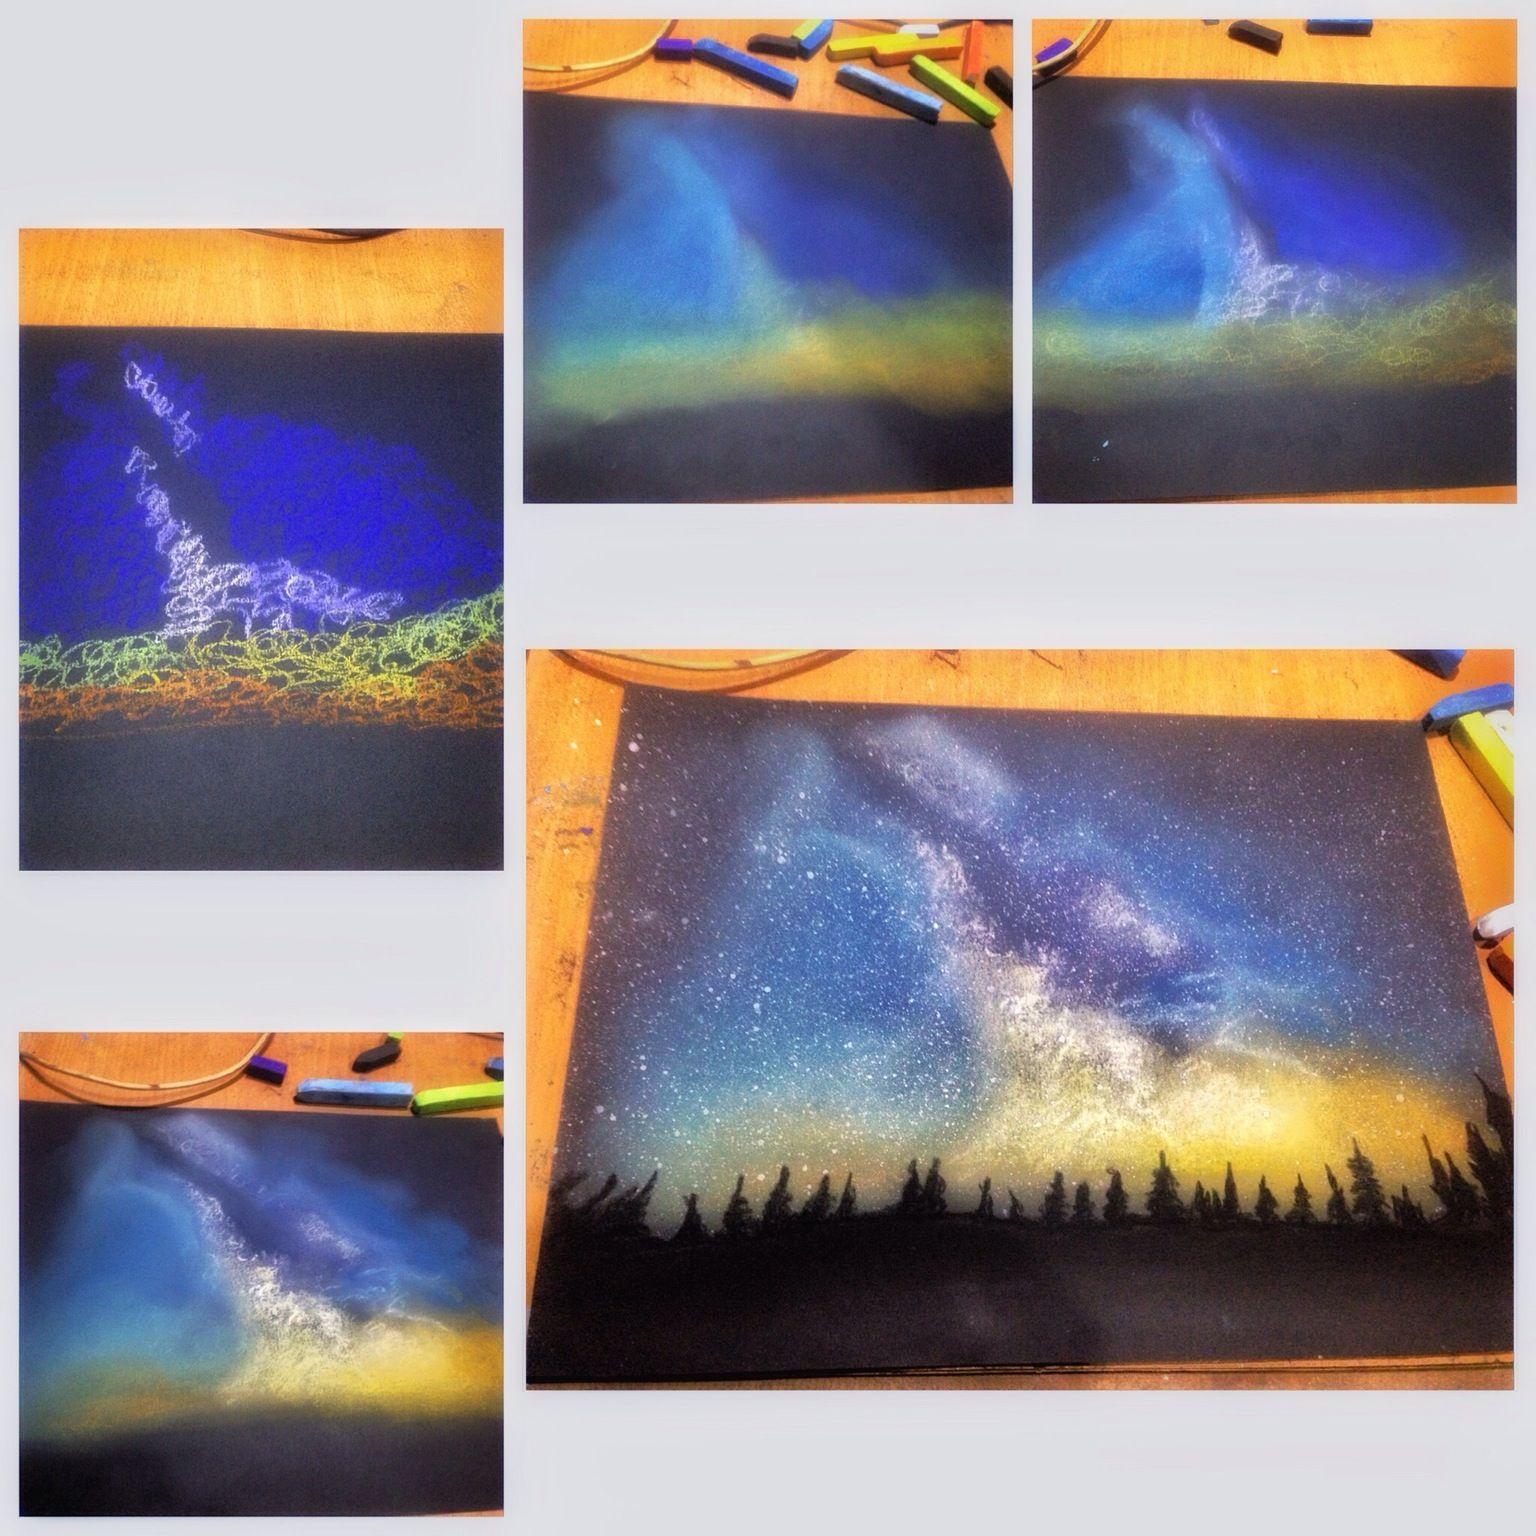 Rainbow landscape original oil pastel drawing - 0811fde999104caaaa1544789334b0bb 1536 1536 Pastel Artworkpastel Paintingschalk